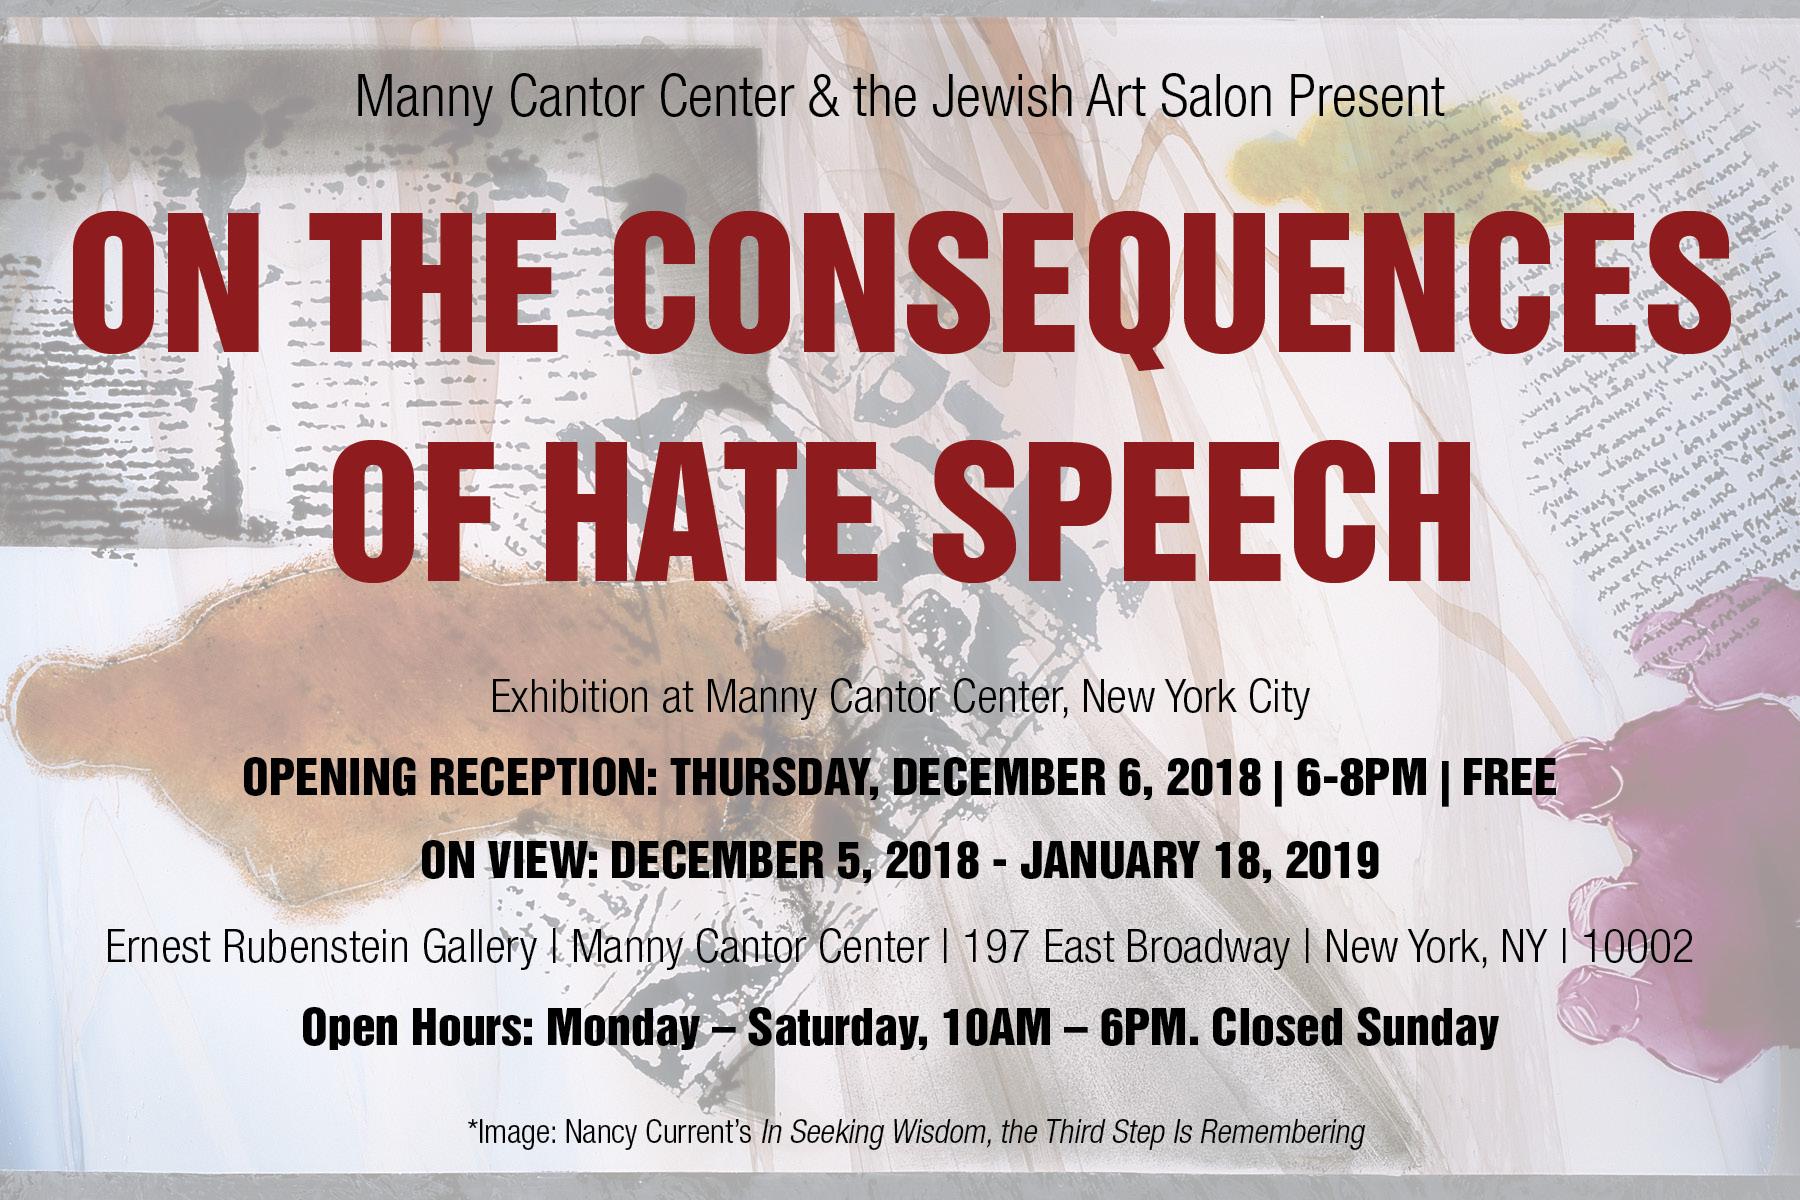 consequences of hate speech - postcard (1).jpg